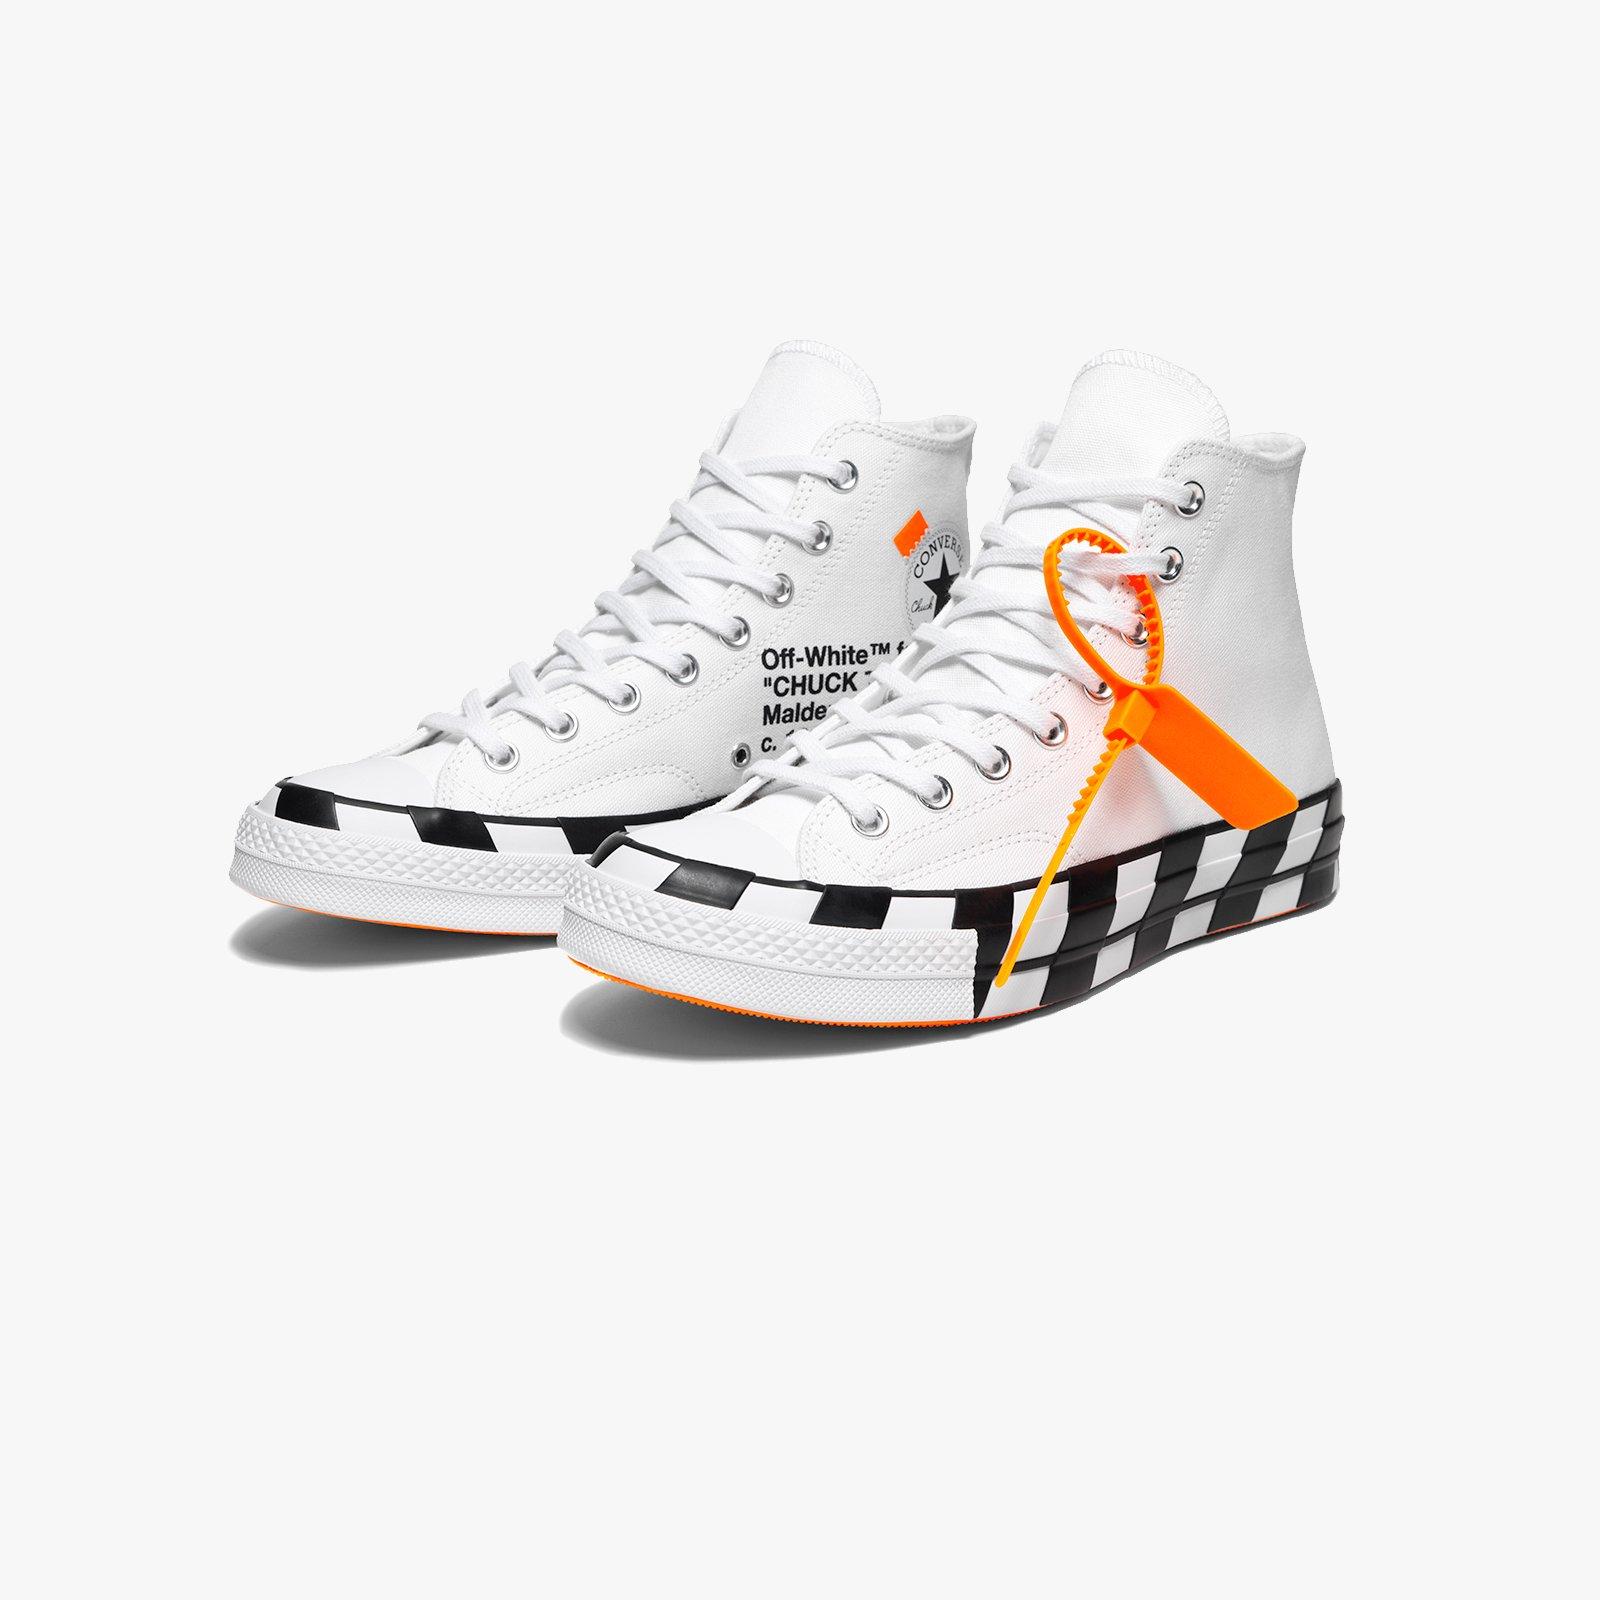 Converse Chuck Taylor 70 x Off White - 163862c - Sneakersnstuff ... f55311b24